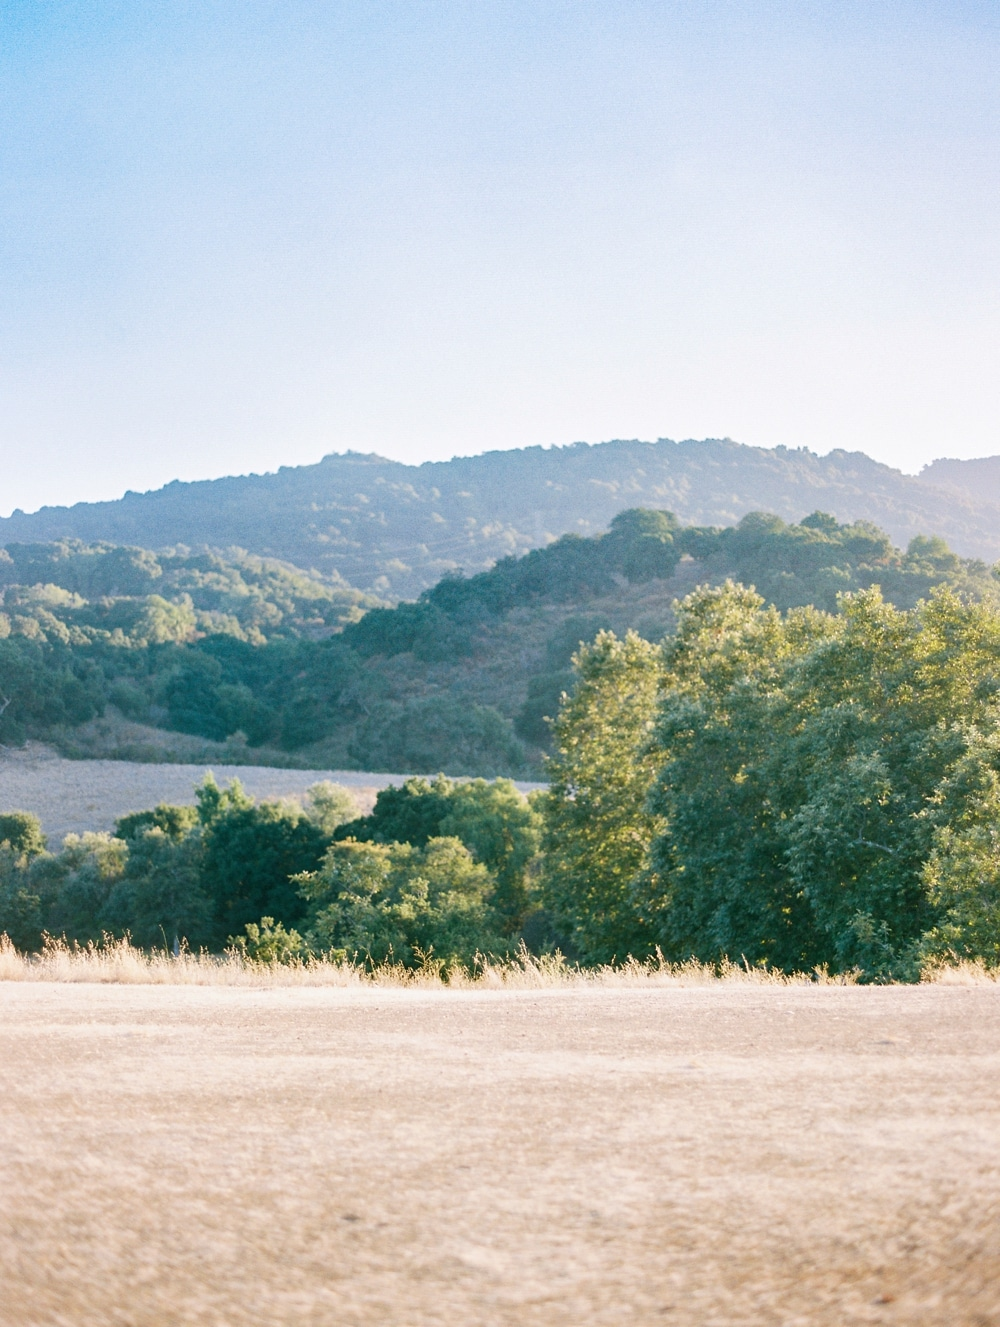 Kristin-La-Voie-Photography-california-wedding-photographer-dog-session-rancho-san-antonio-los-altos-35